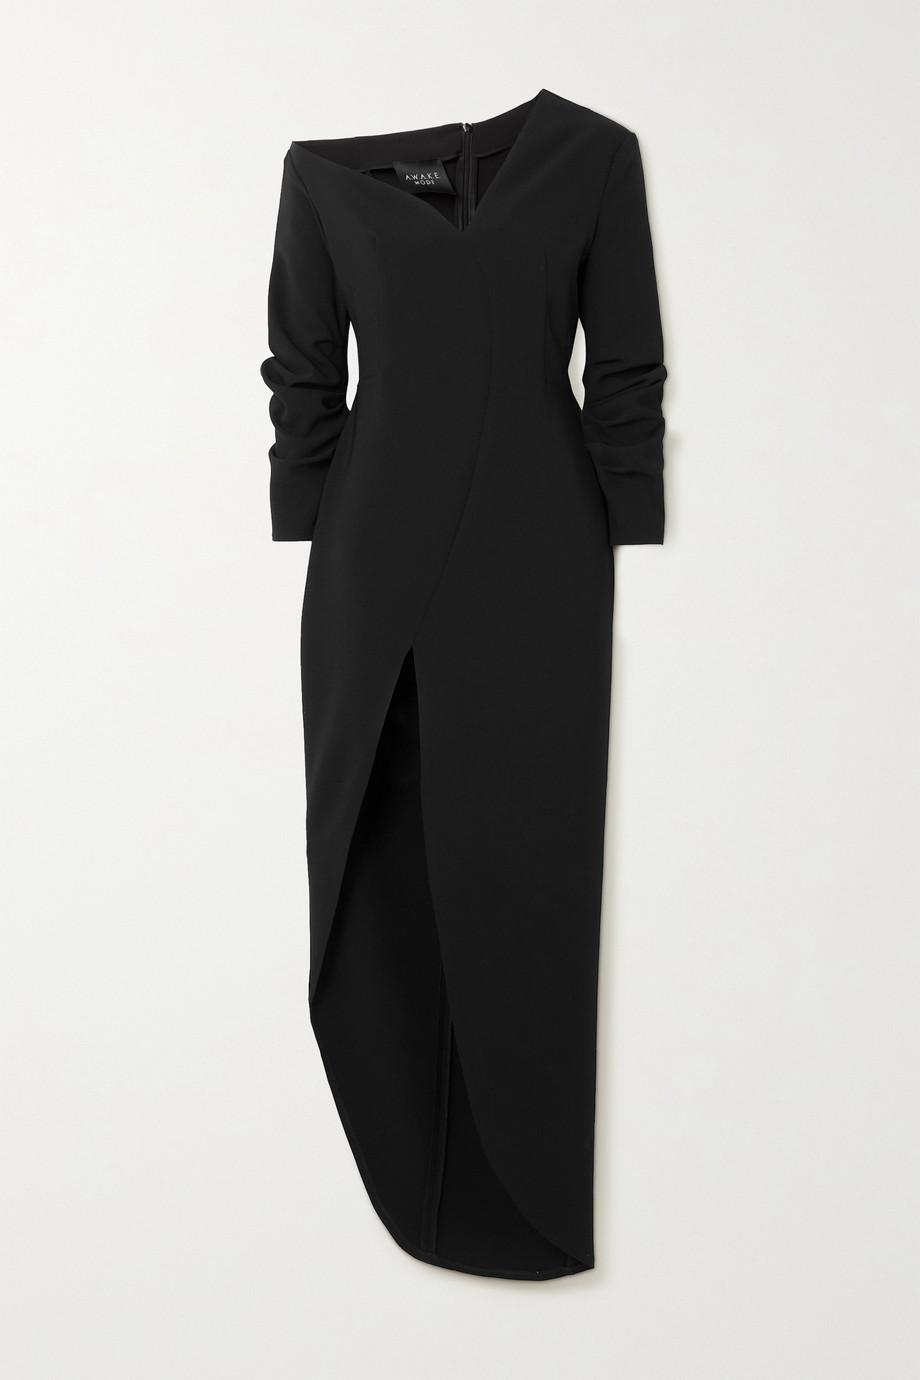 A.W.A.K.E. MODE Off-the-shoulder asymmetric crepe dress